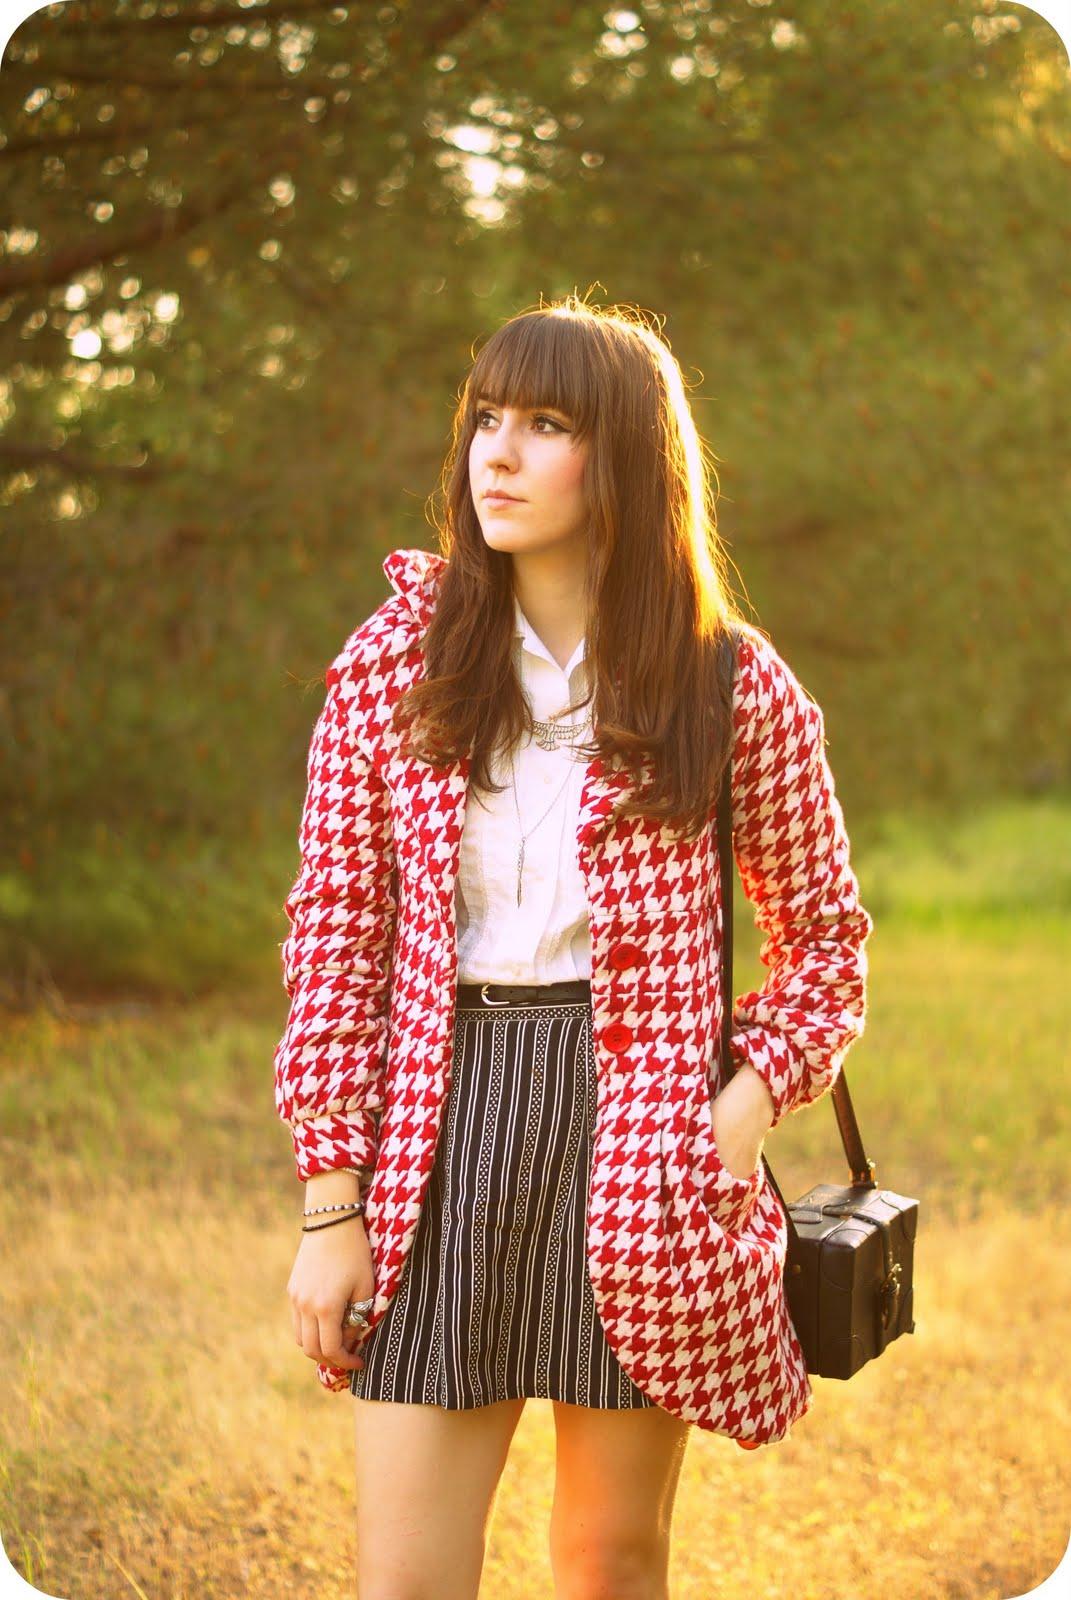 http://1.bp.blogspot.com/-dGz-WyLJ4_k/TcozrQUz-JI/AAAAAAAABYc/jmMBxdYPkBI/s1600/look+up+mod+girl.jpg